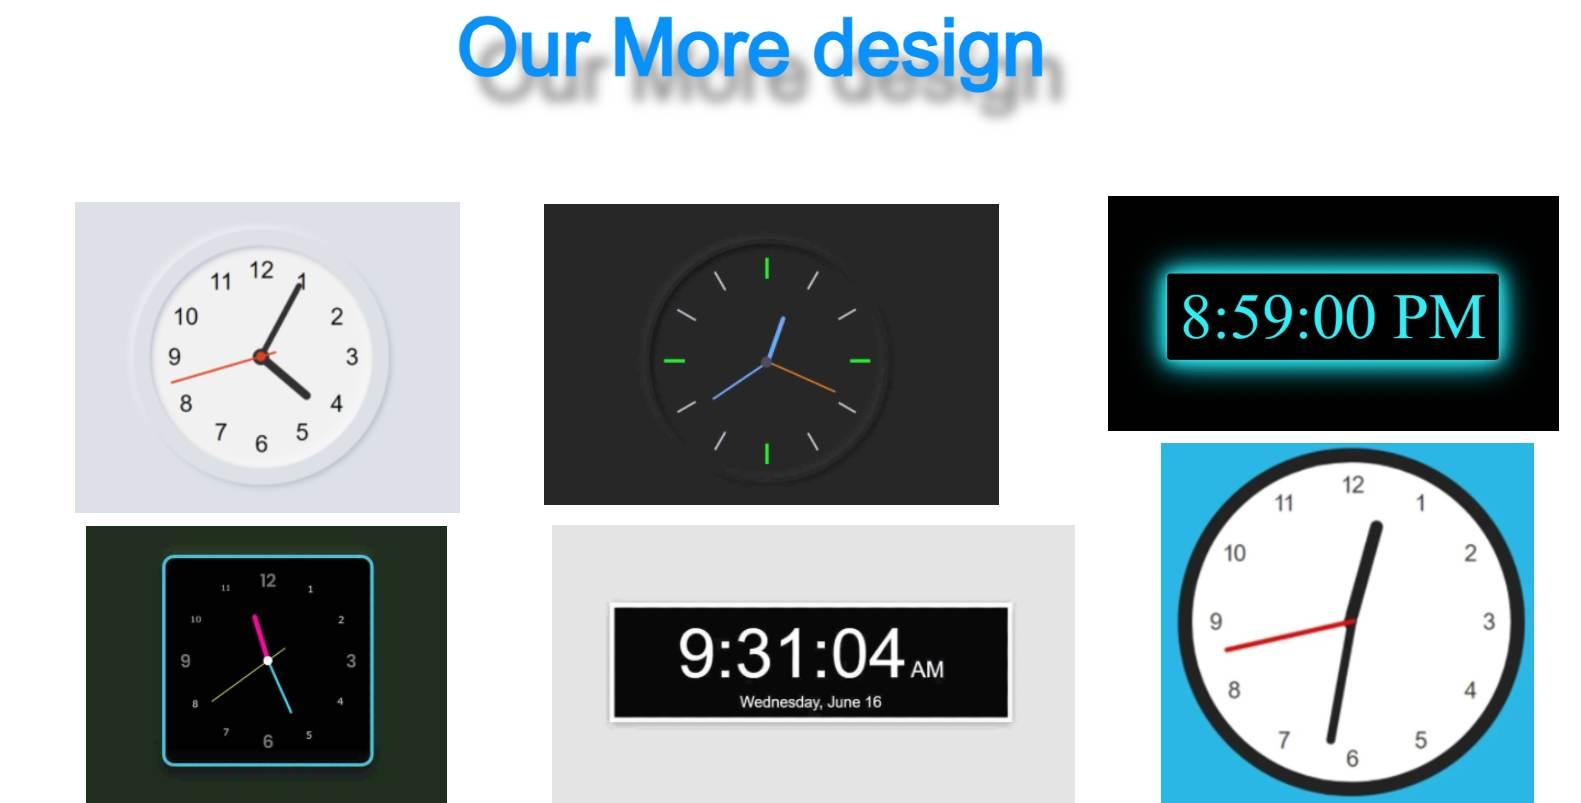 our more design